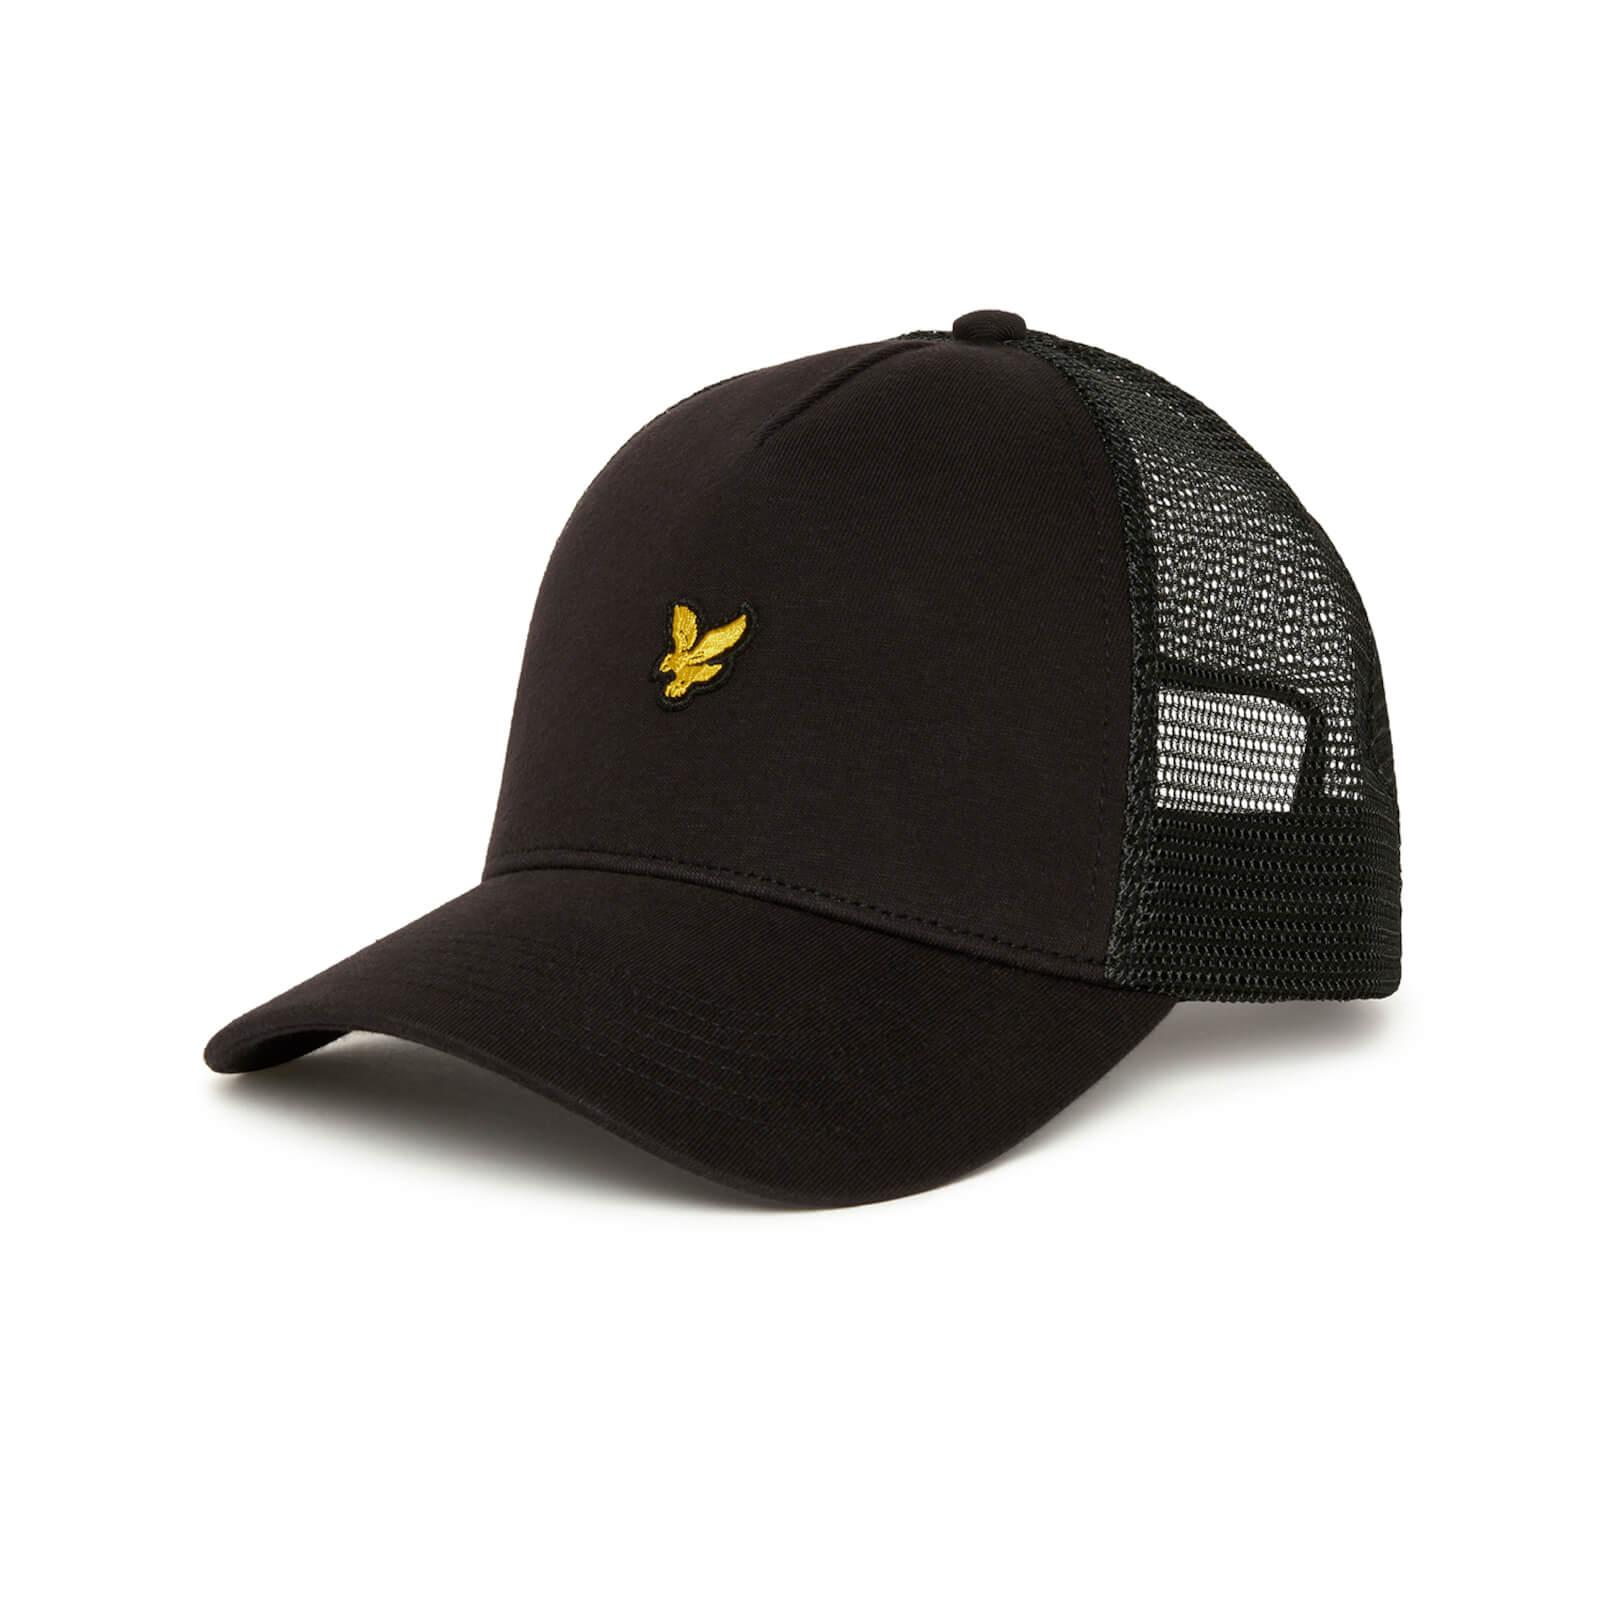 Trucker Cap - True Black/Black Mesh - One Size